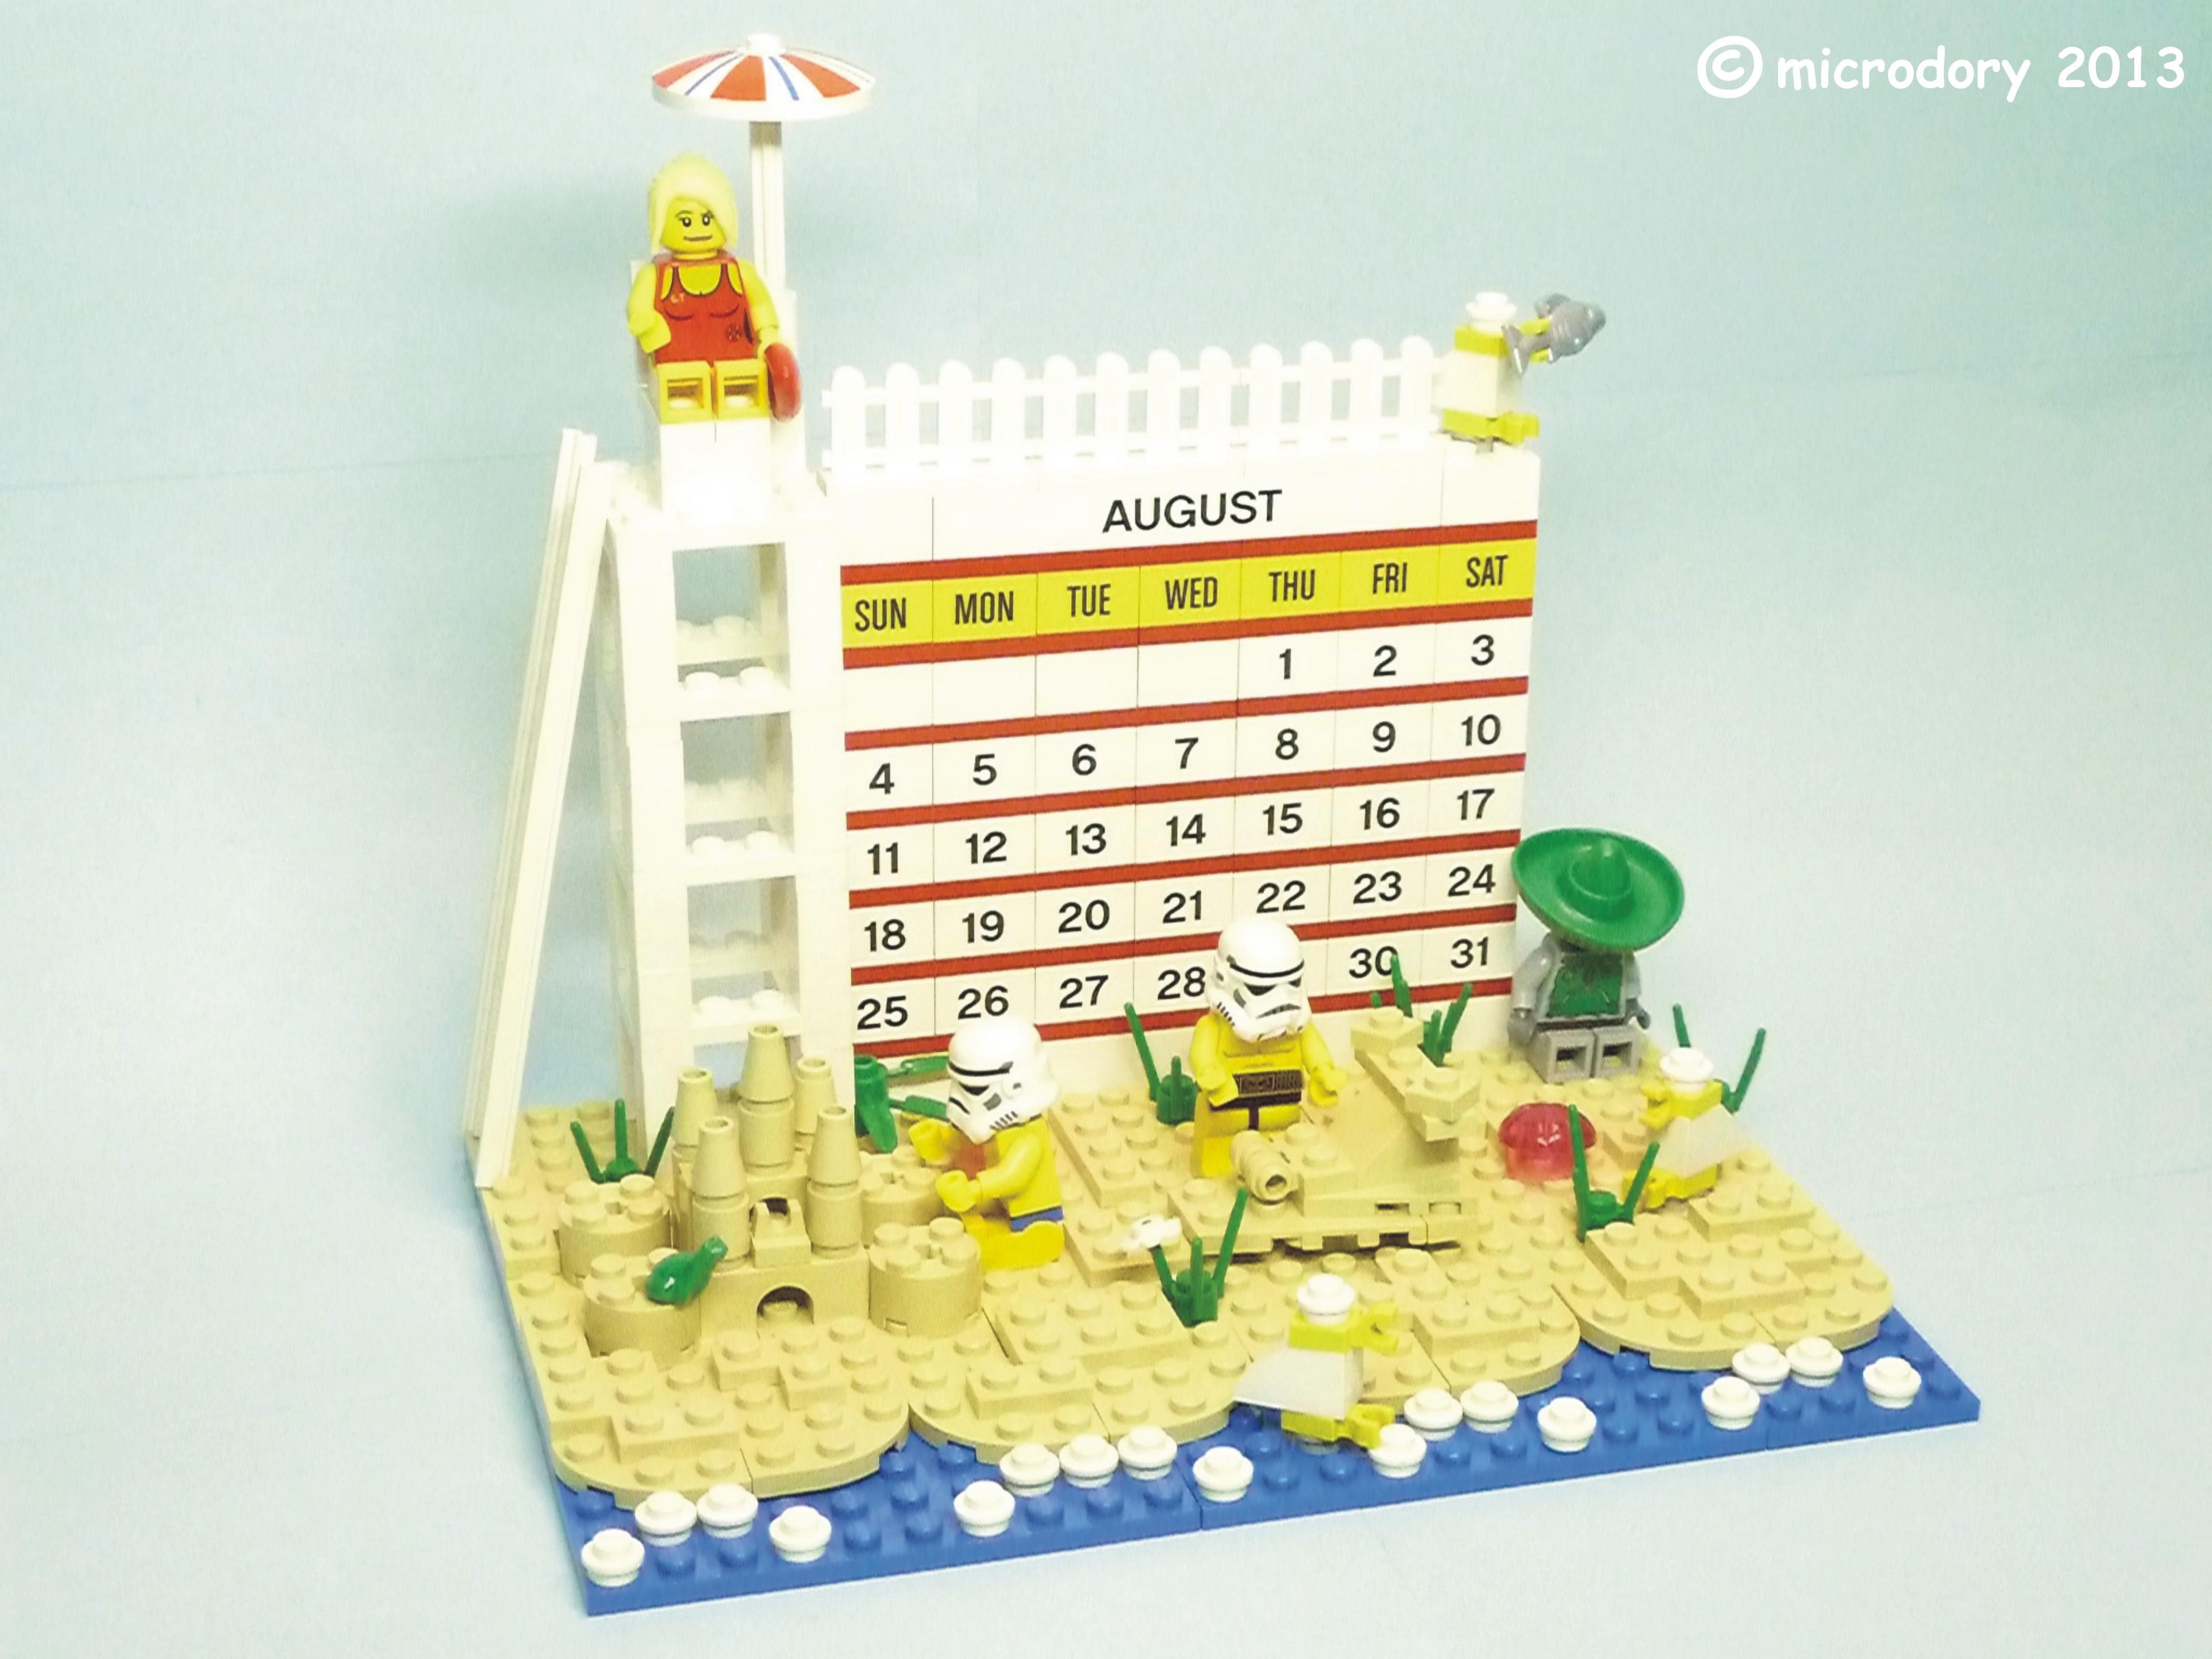 Wallpaper Castle Starwars Sand Funny Calendar Lego August Stormtrooper Bobafett Stardestroyer Microdory 4266x3199 928549 Hd Wallpapers Wallhere